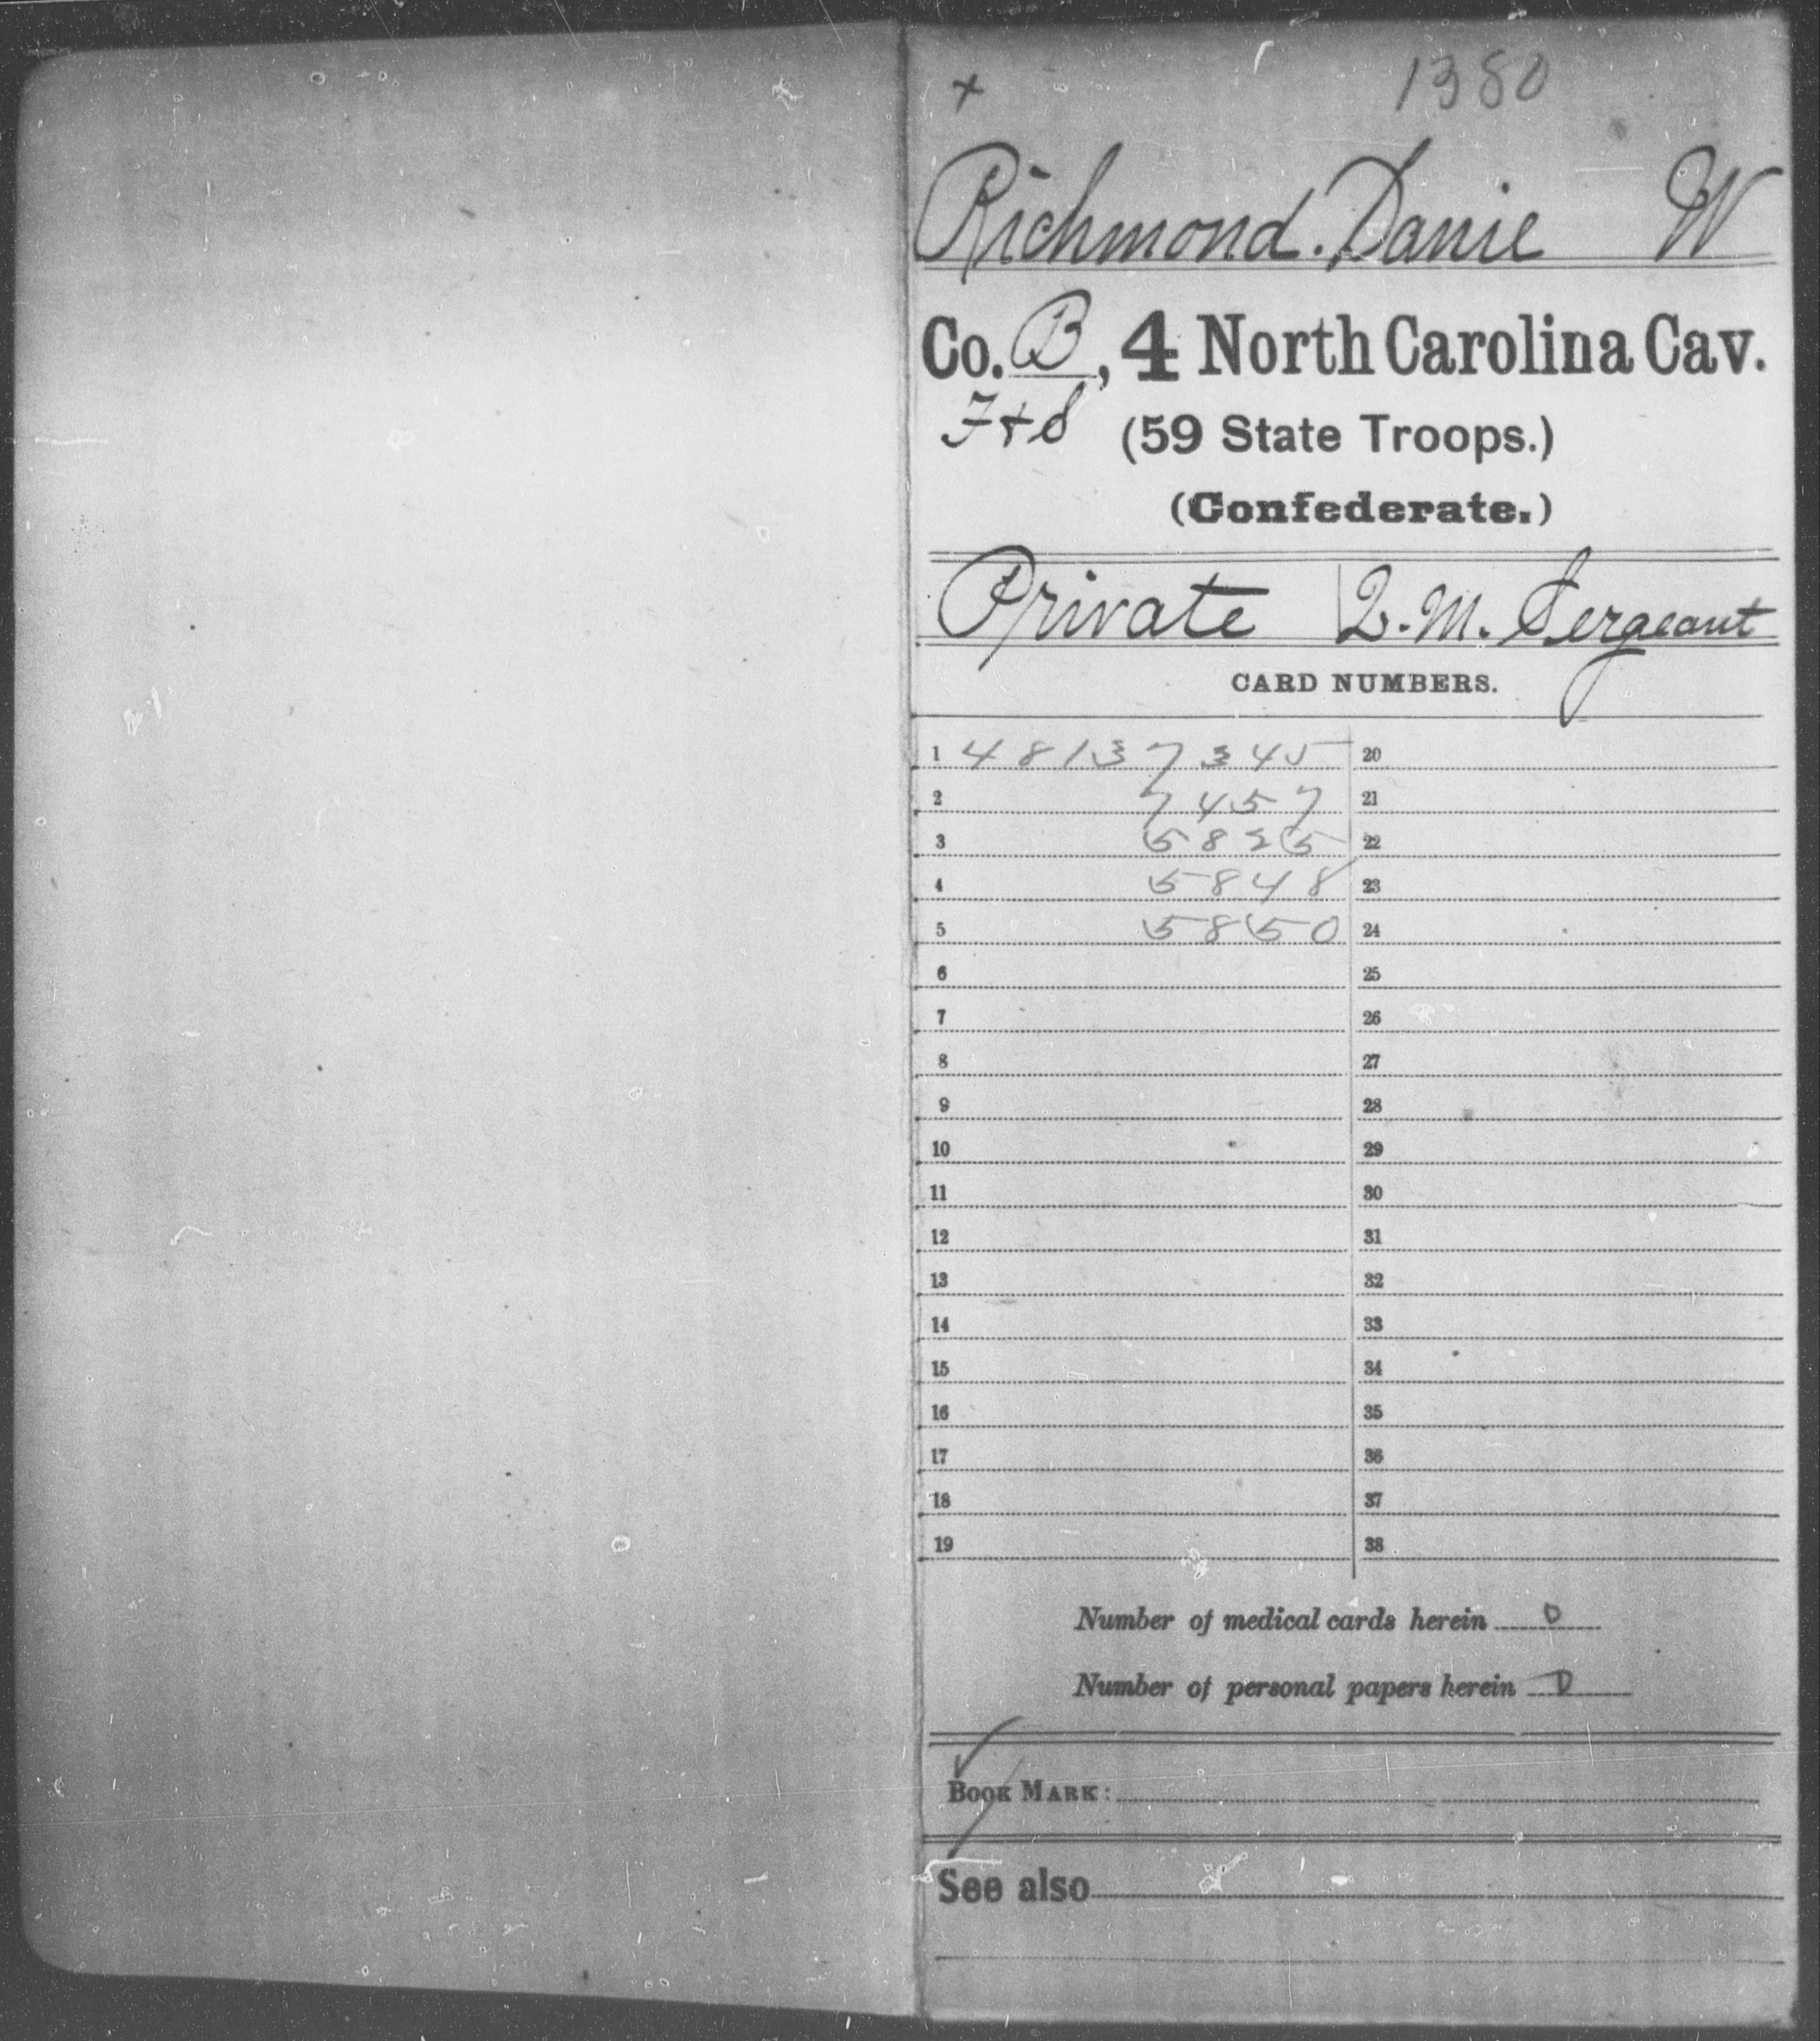 Richmond, Danie W - Fourth Cavalry (59th State Troops)